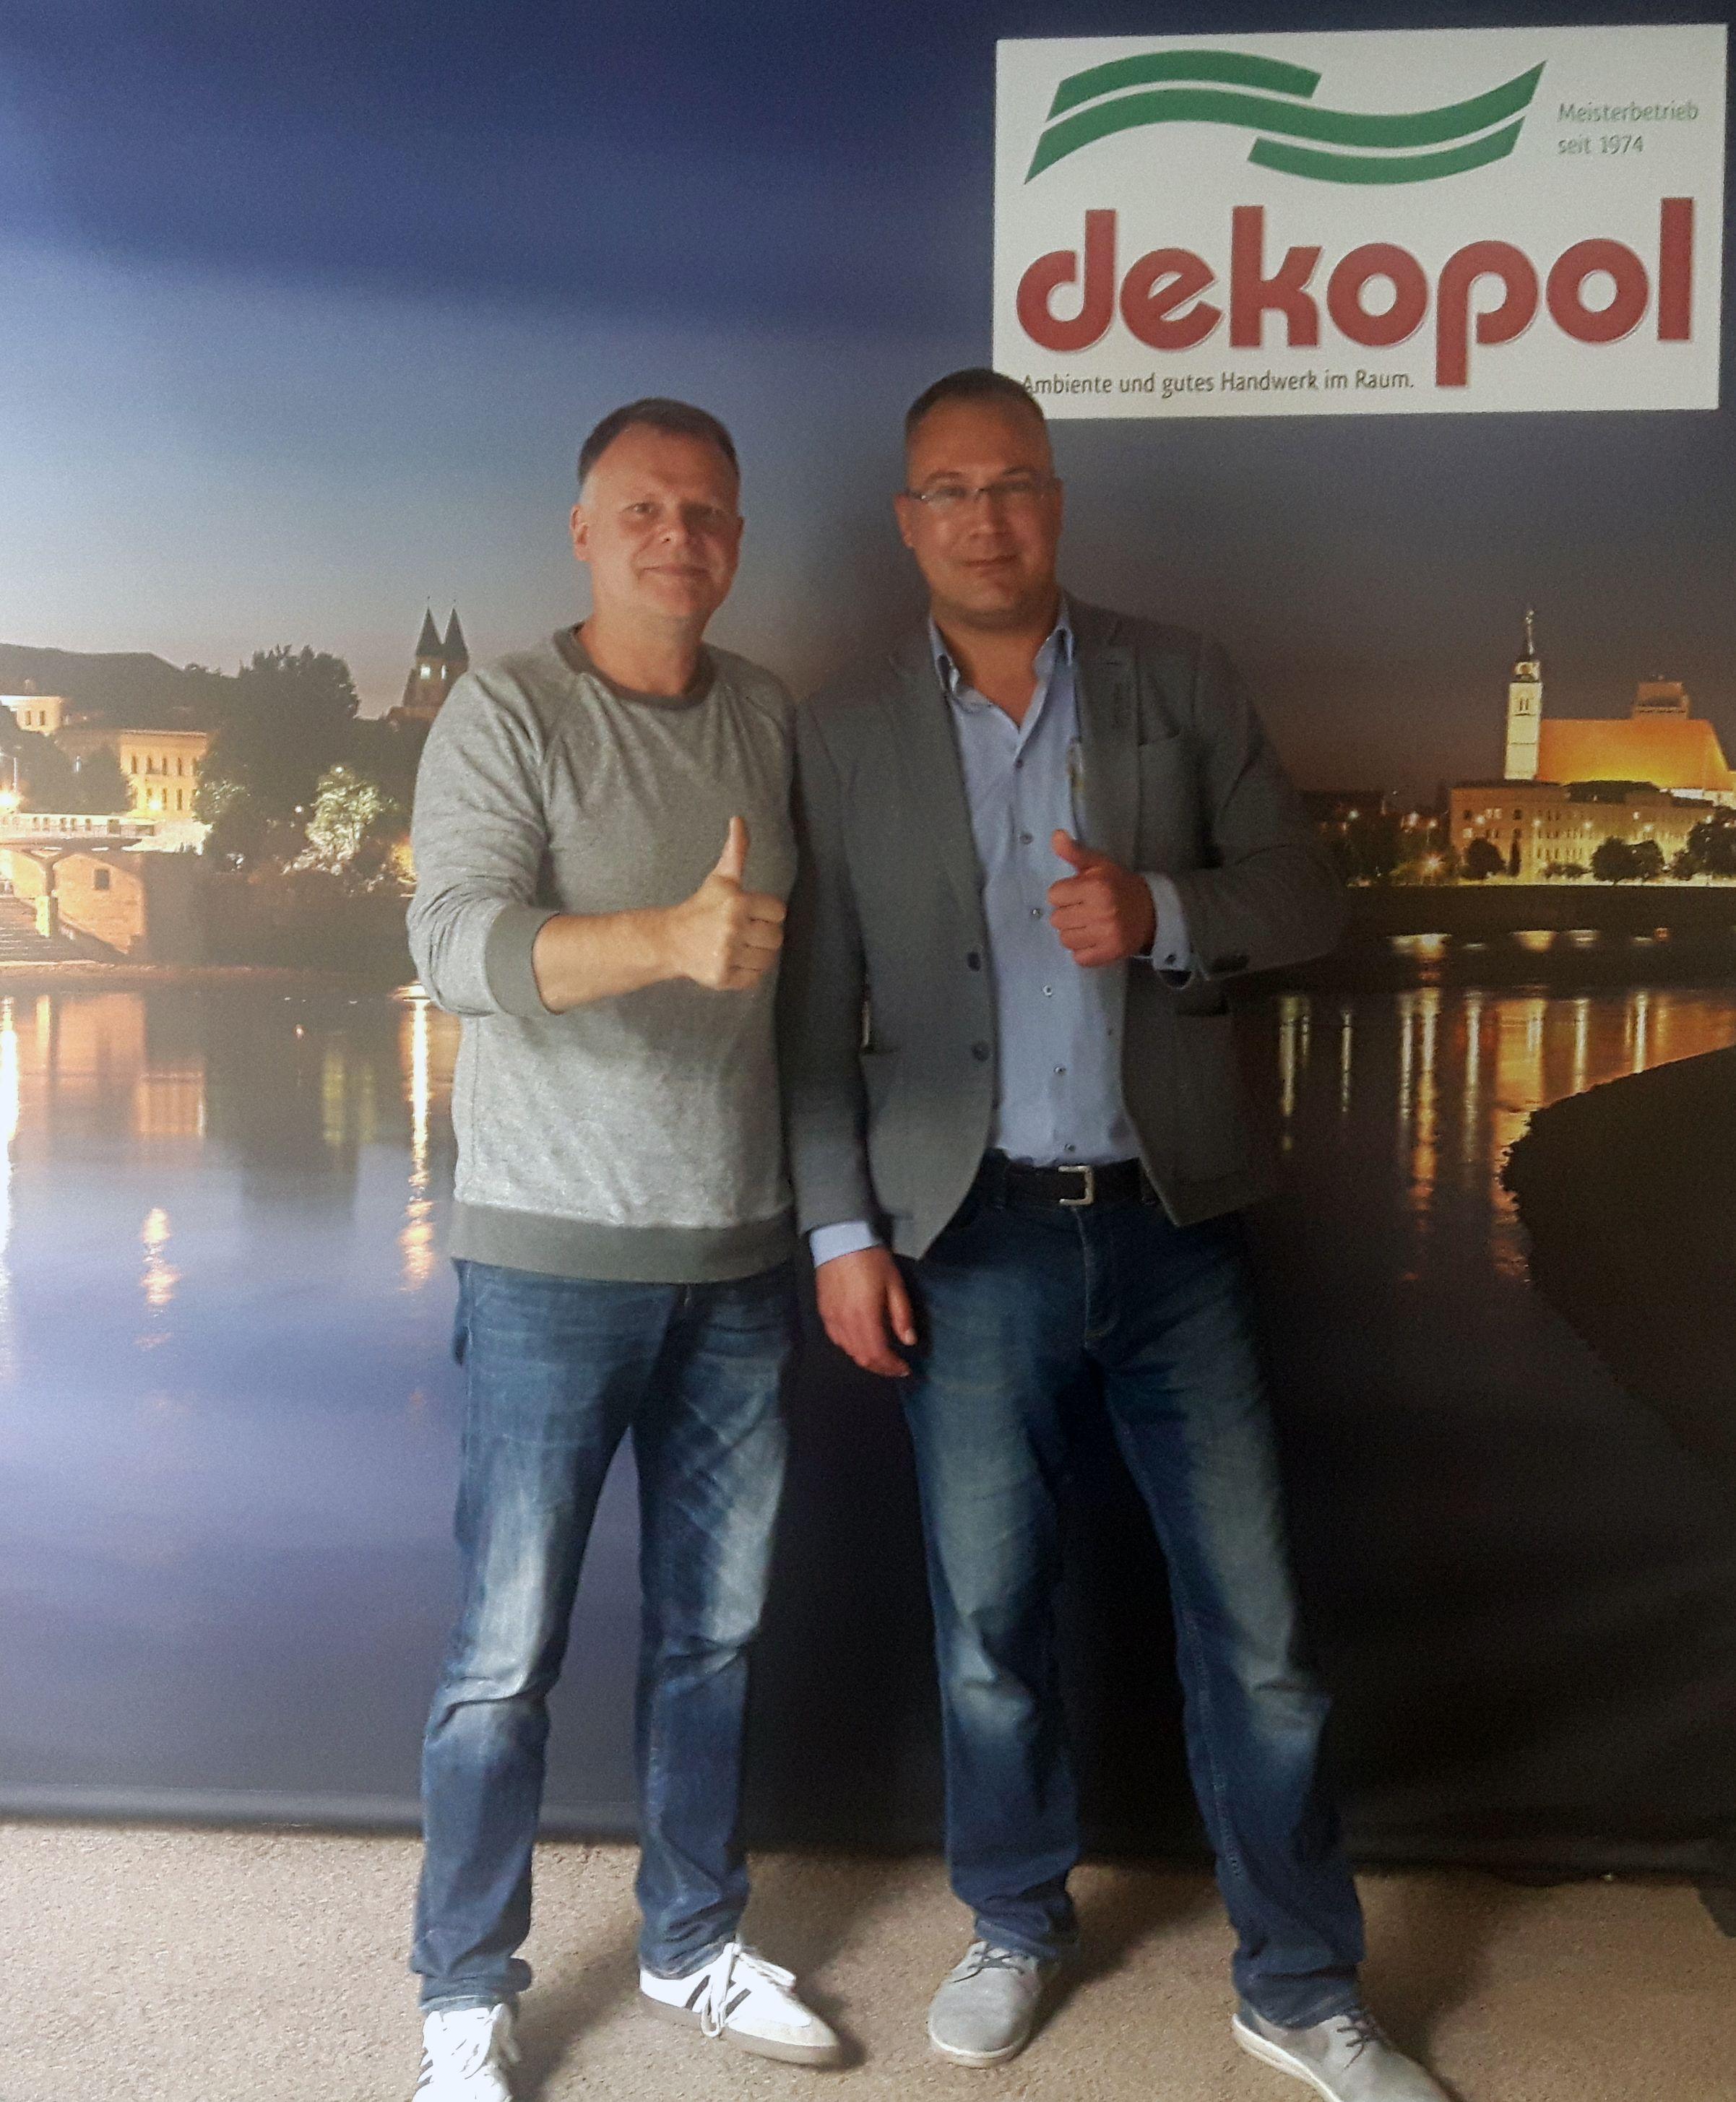 Raumausstatter Magdeburg david fehse zu gast bei dekopol in magdeburg neuer firmenkunde